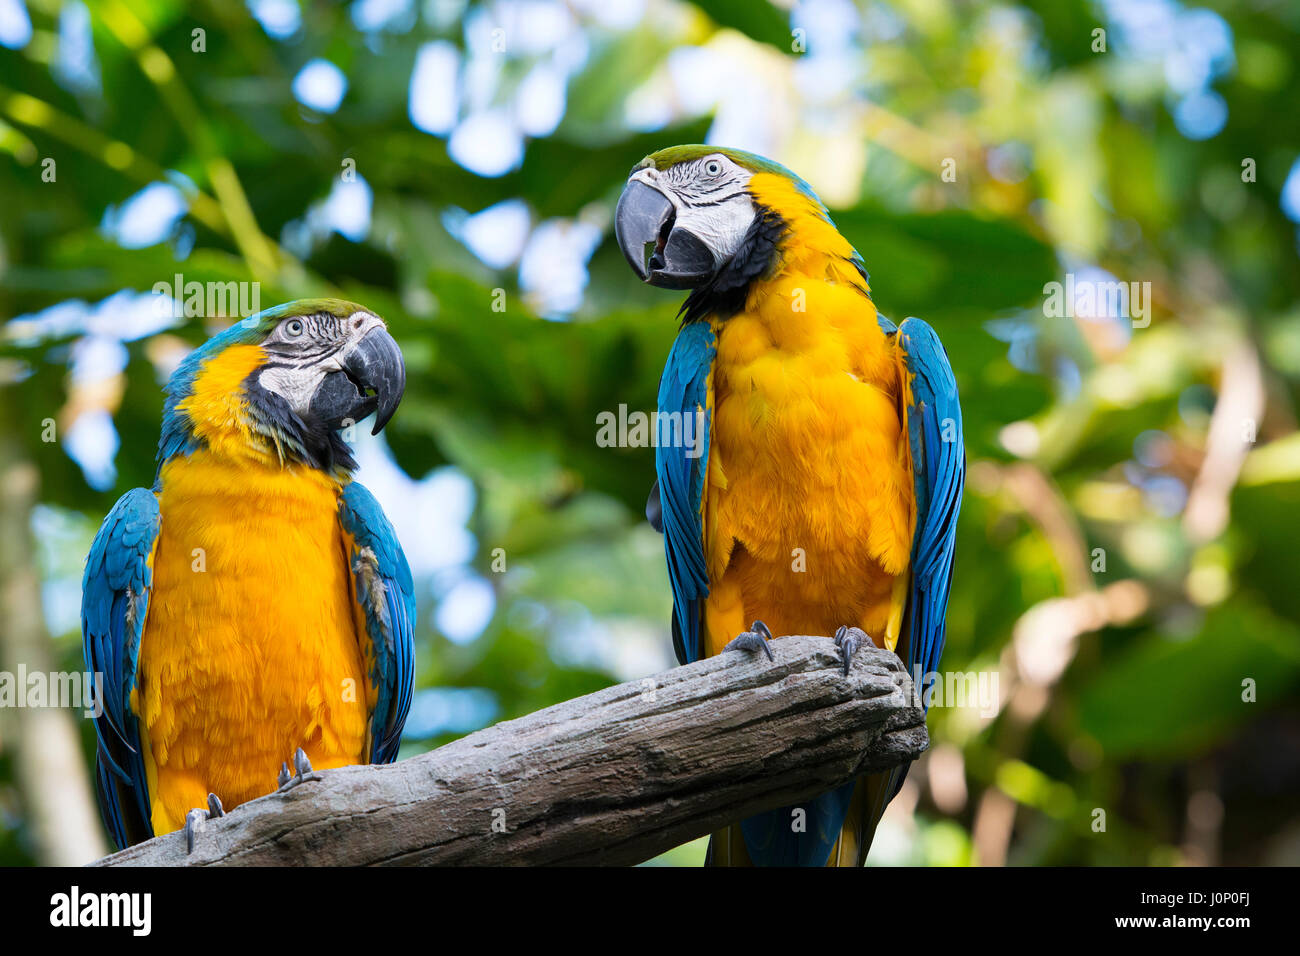 Macaw Parrots, Blue and Yellow Gold Ara Ararauna, Birds - Stock Image